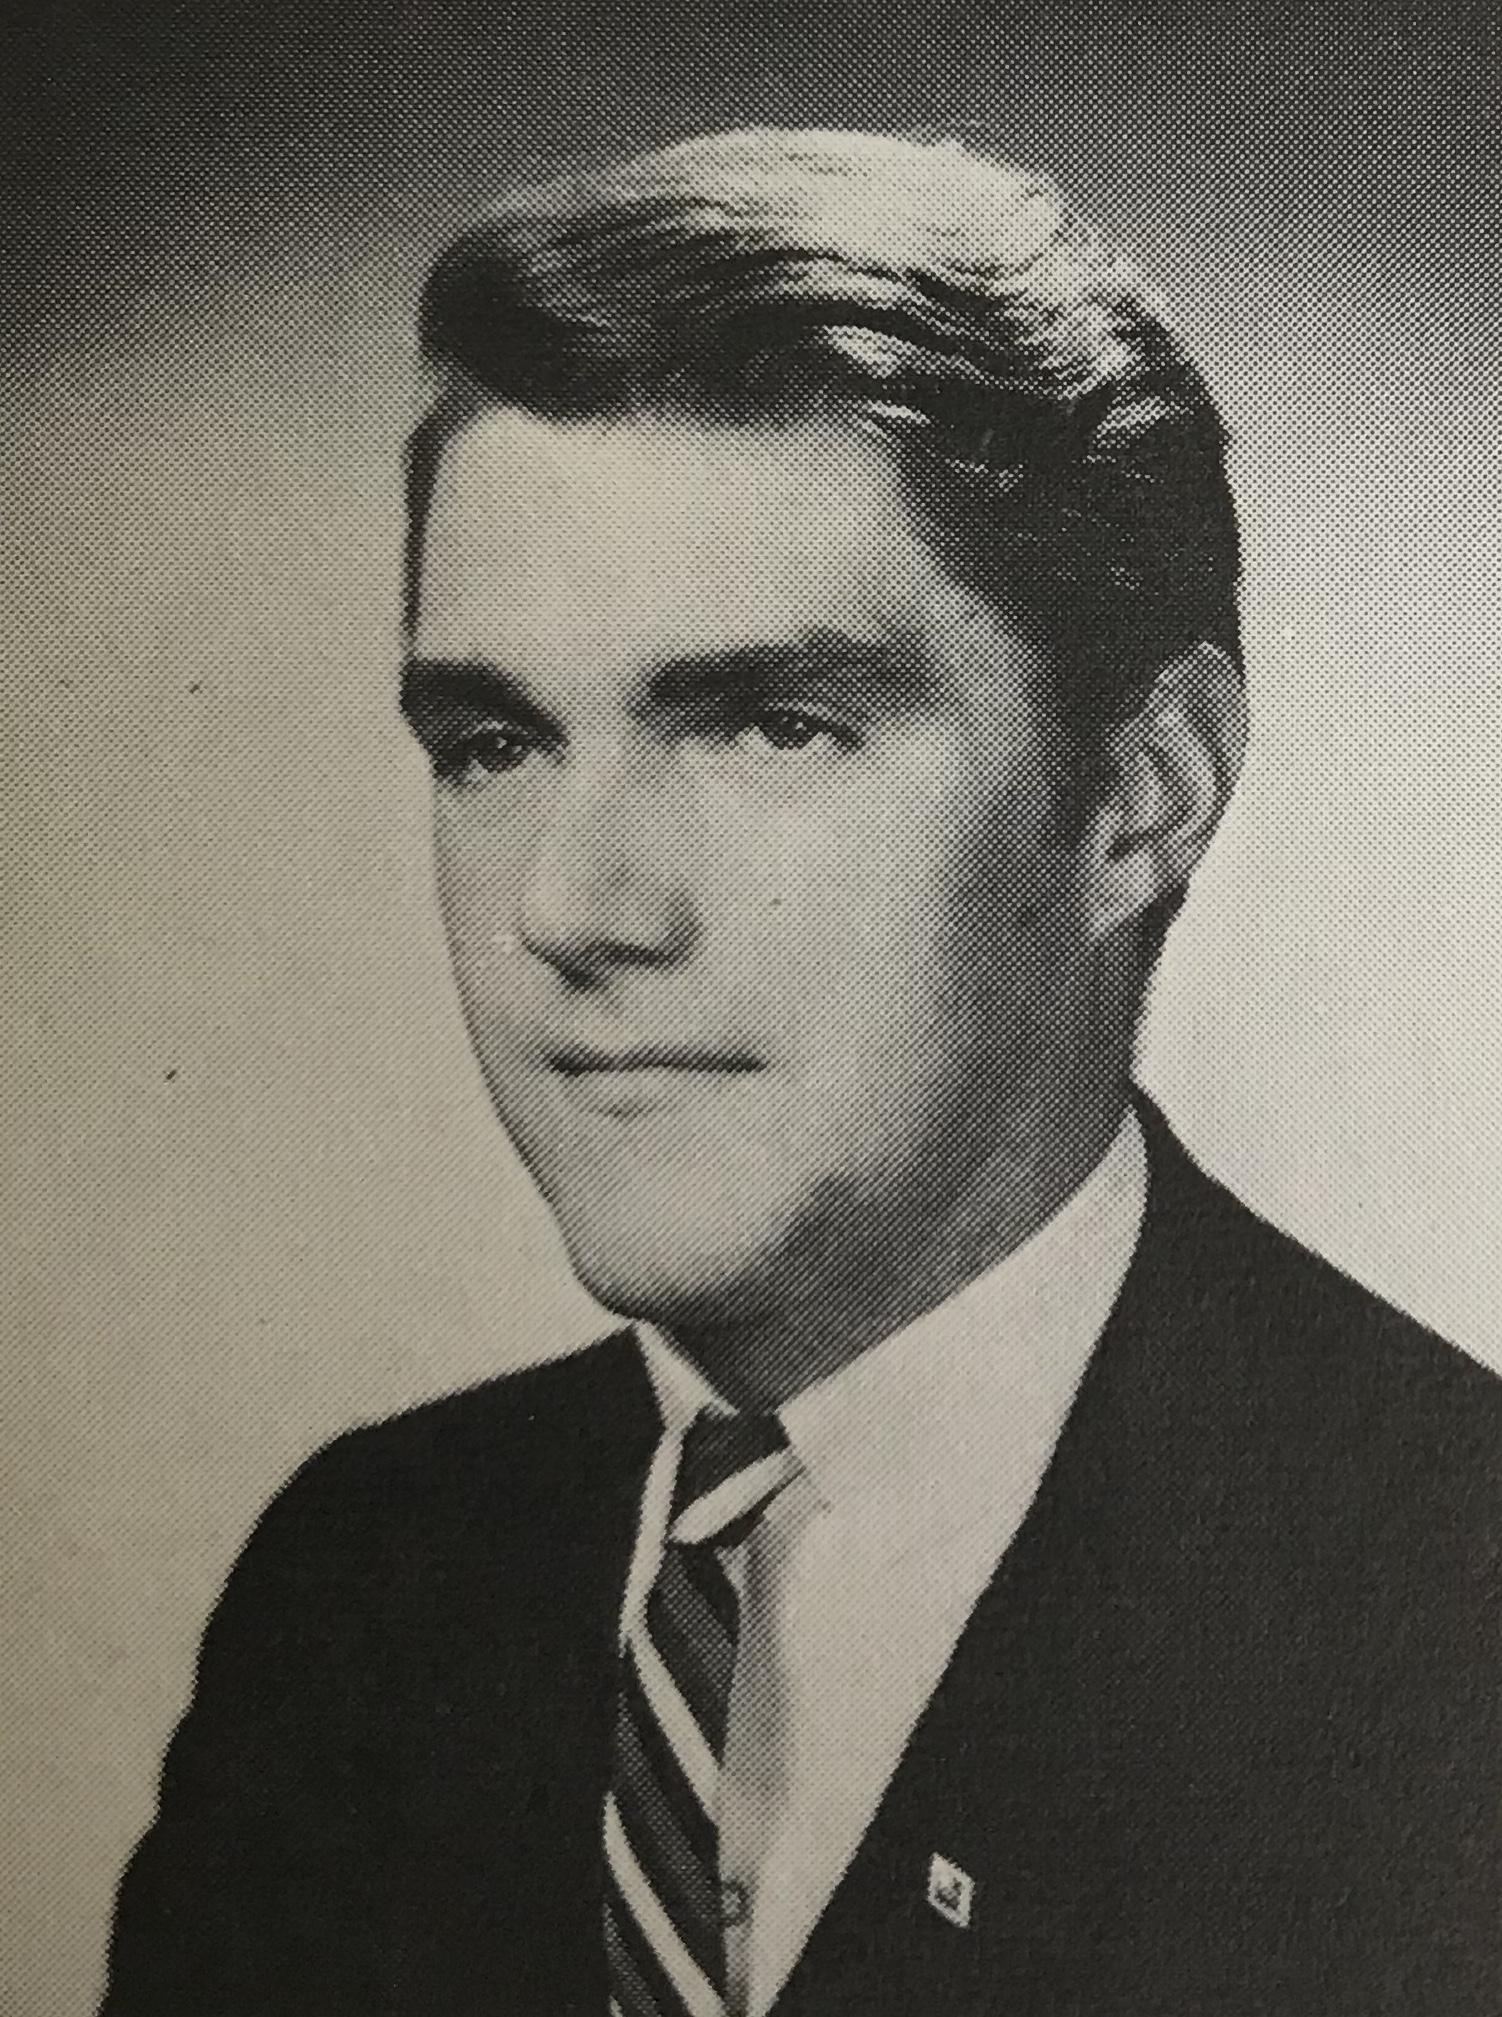 Rick McDowell